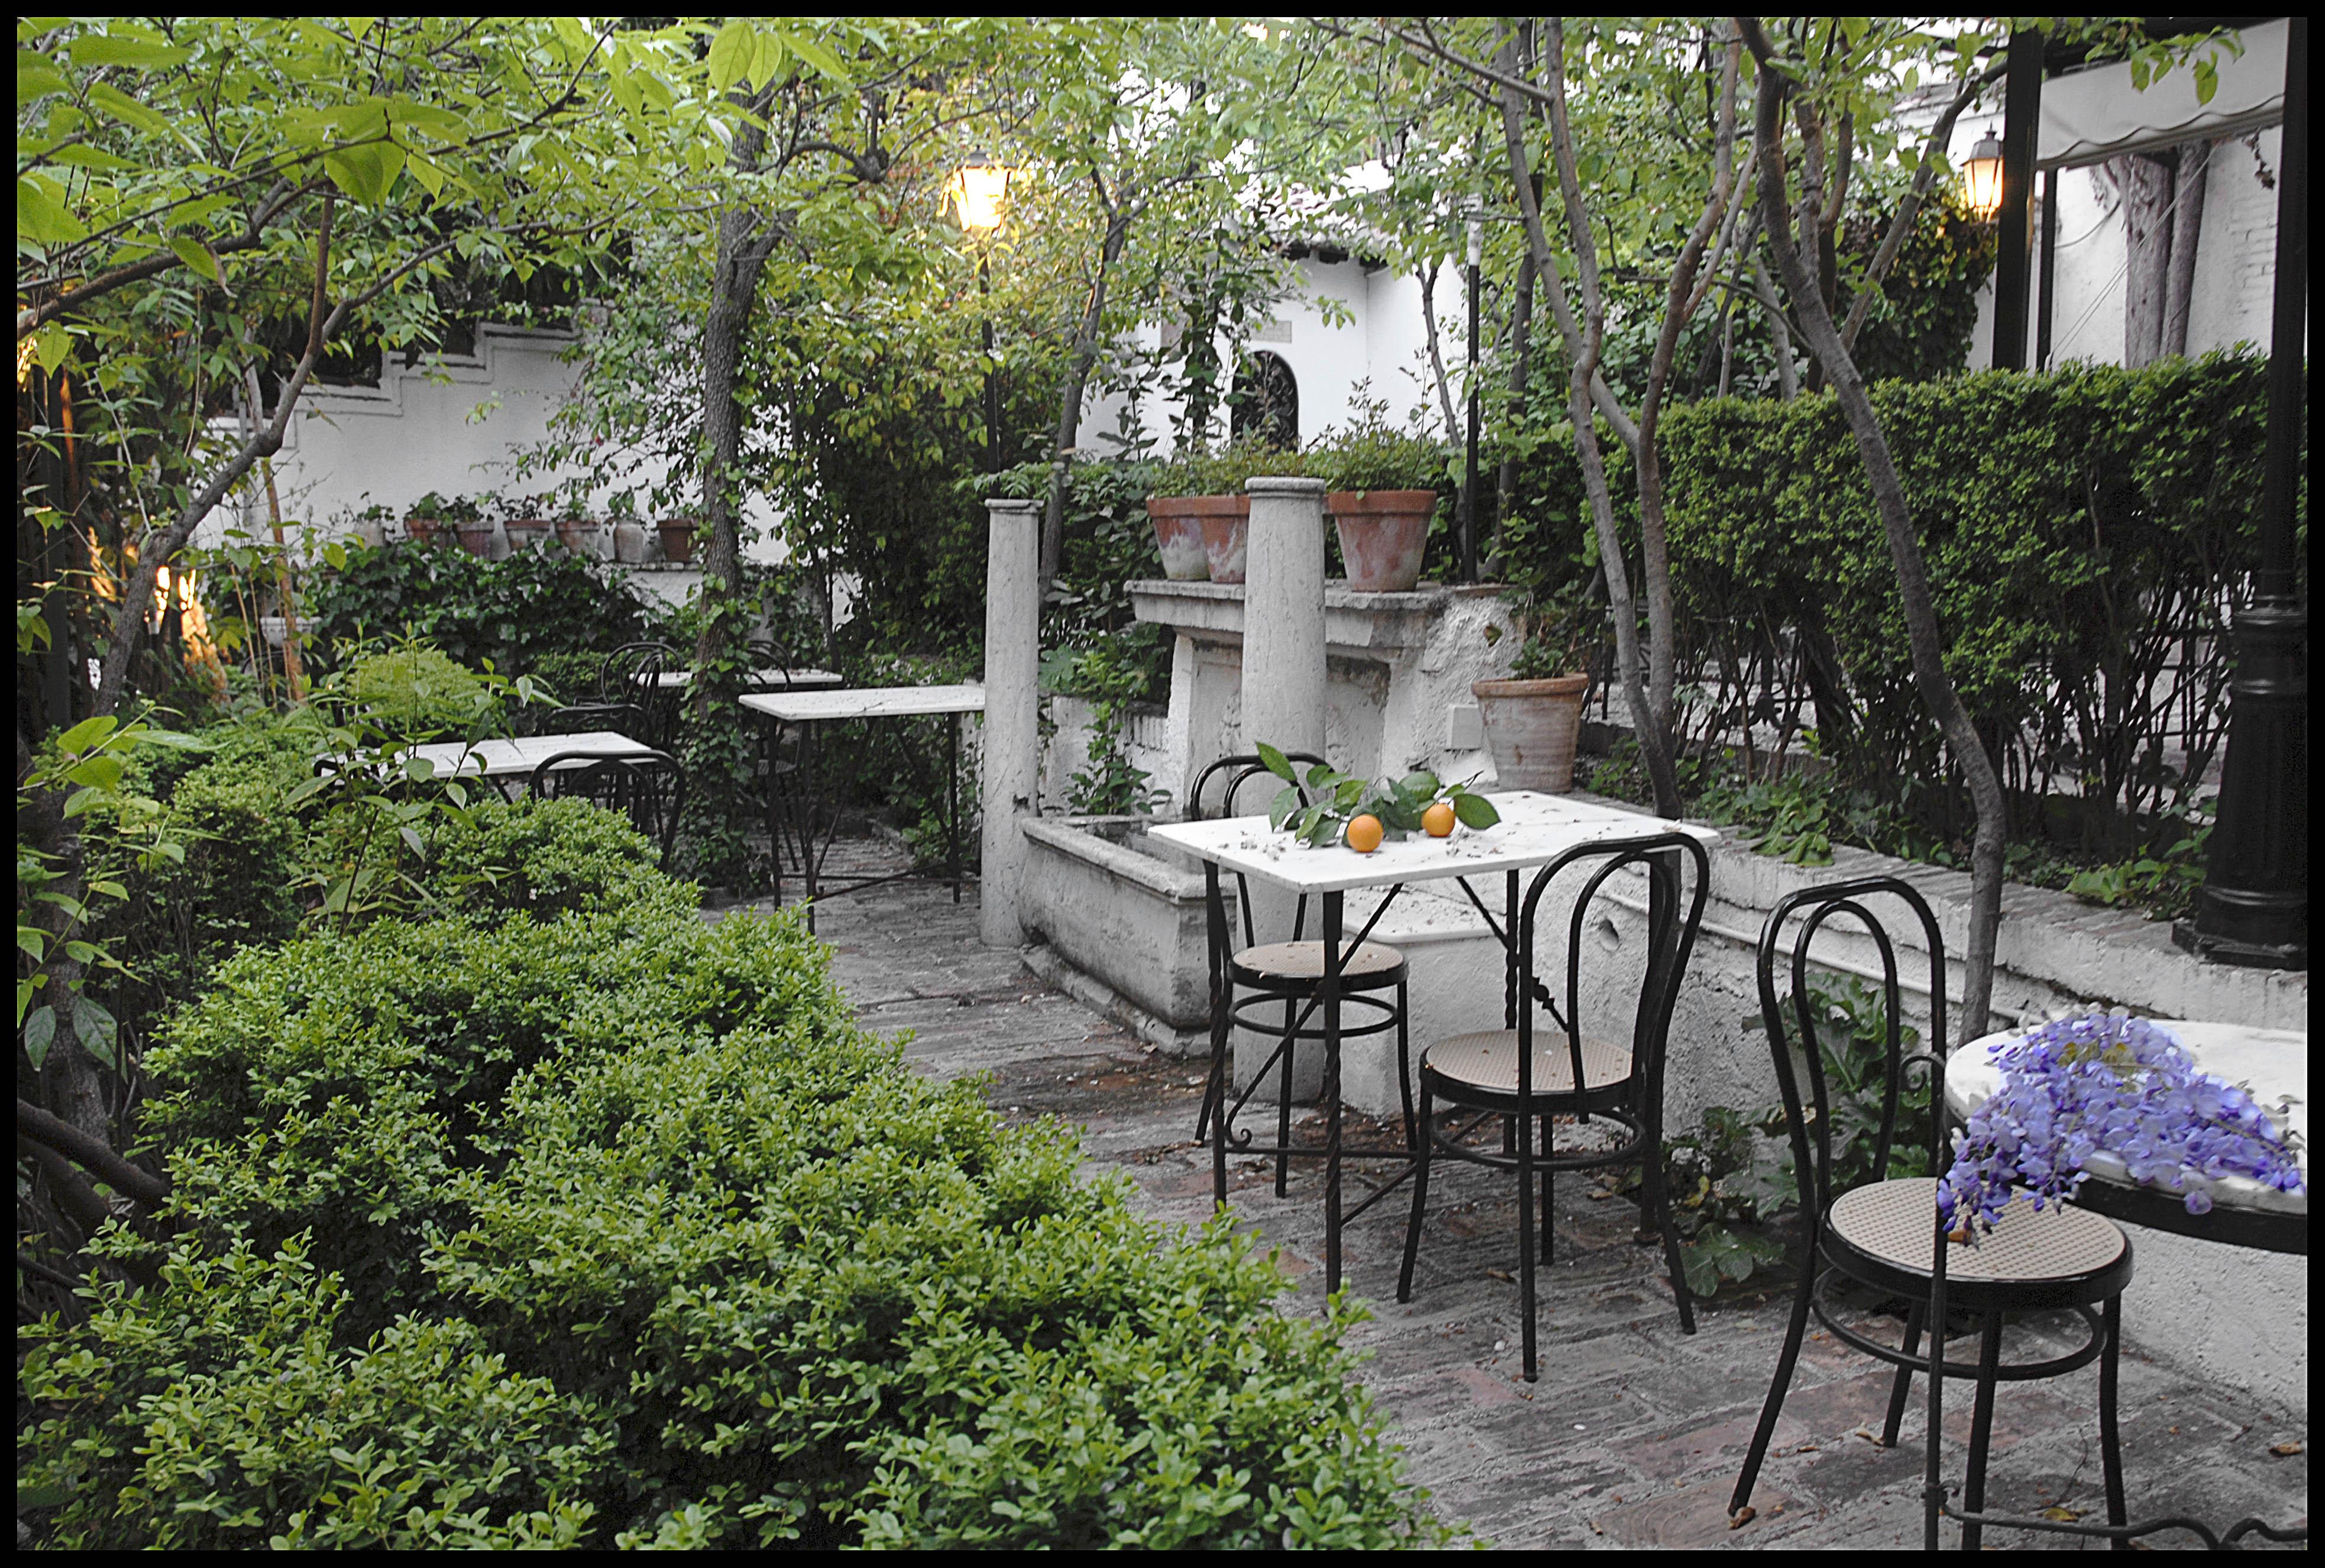 Jardin terraza atardecer web mirador de morayma for Terraza jardin